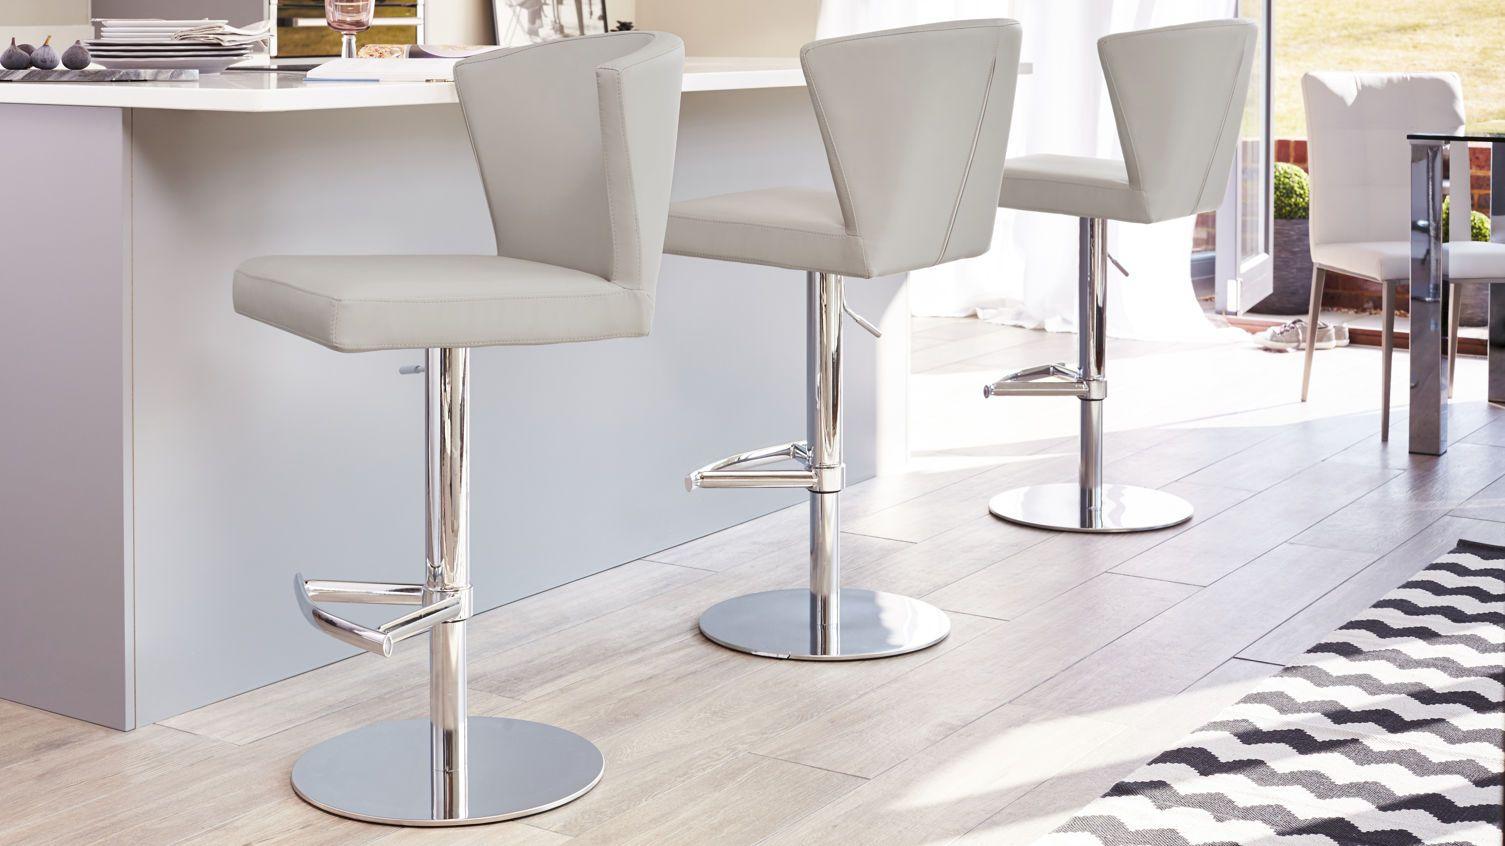 Curva Gas Lift Bar Stool Contemporary bar stools, Bar